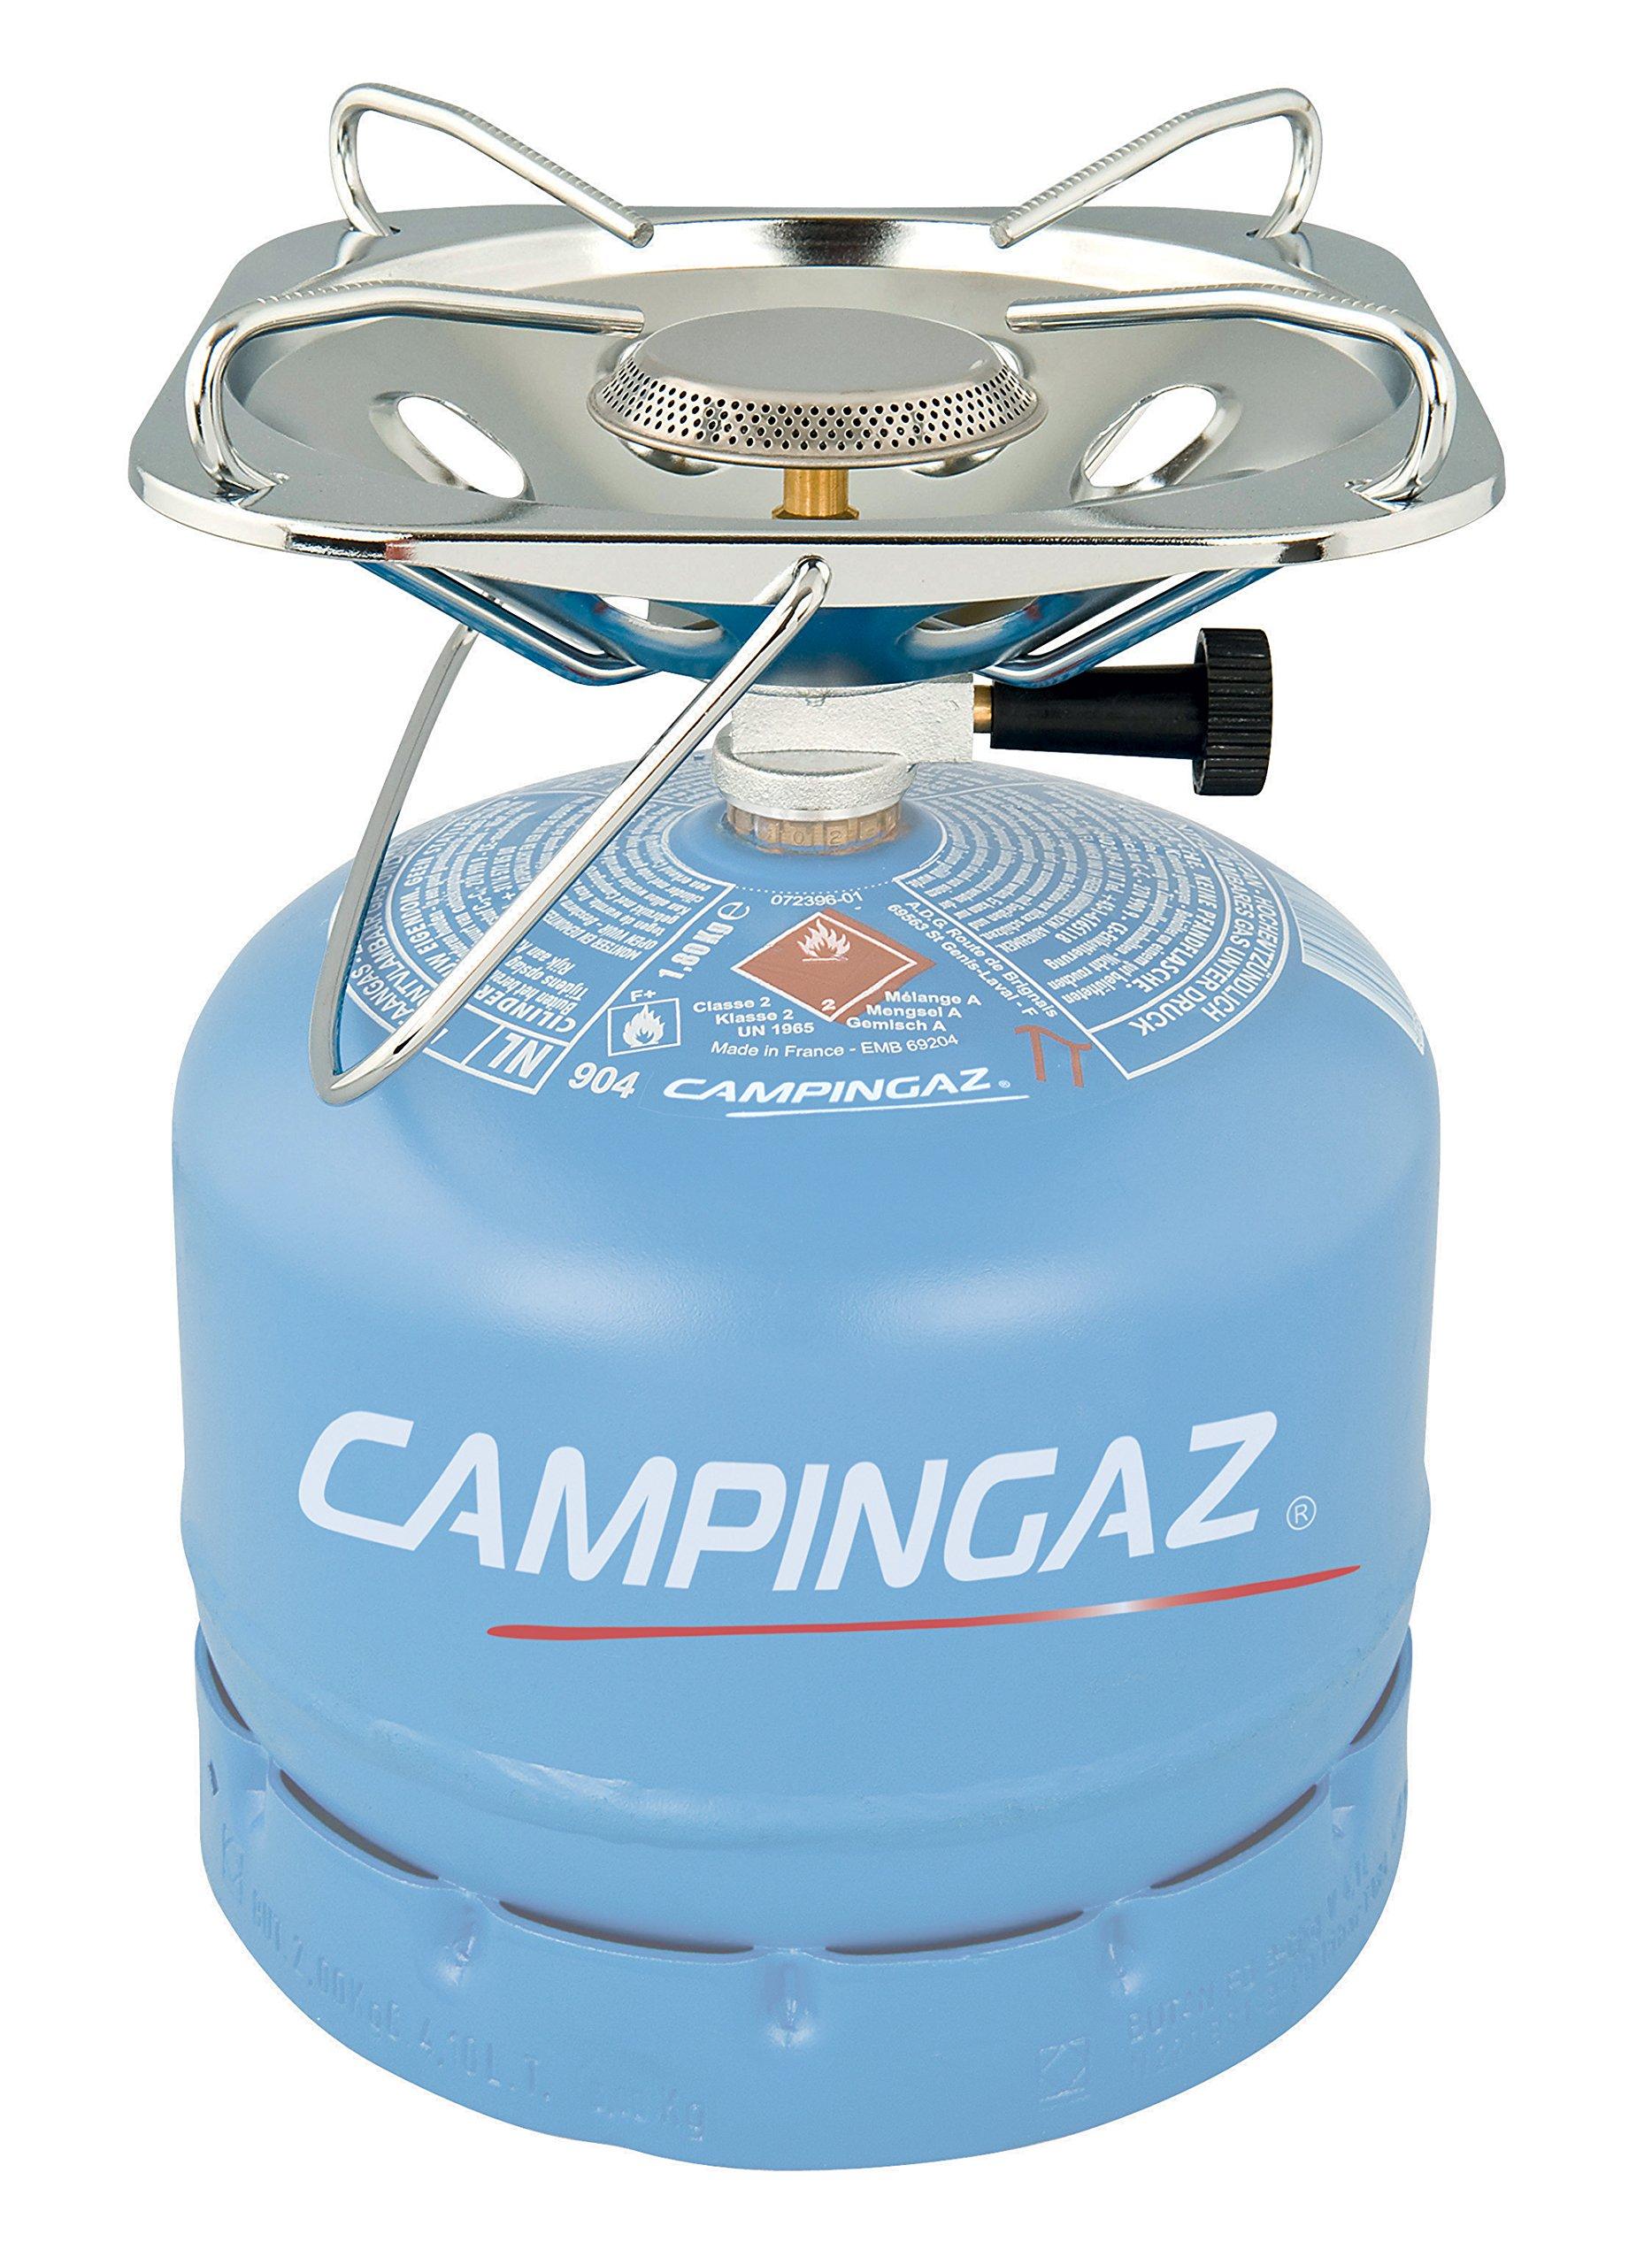 Campingaz Super Carena R - Hornillo de gas para camping product image